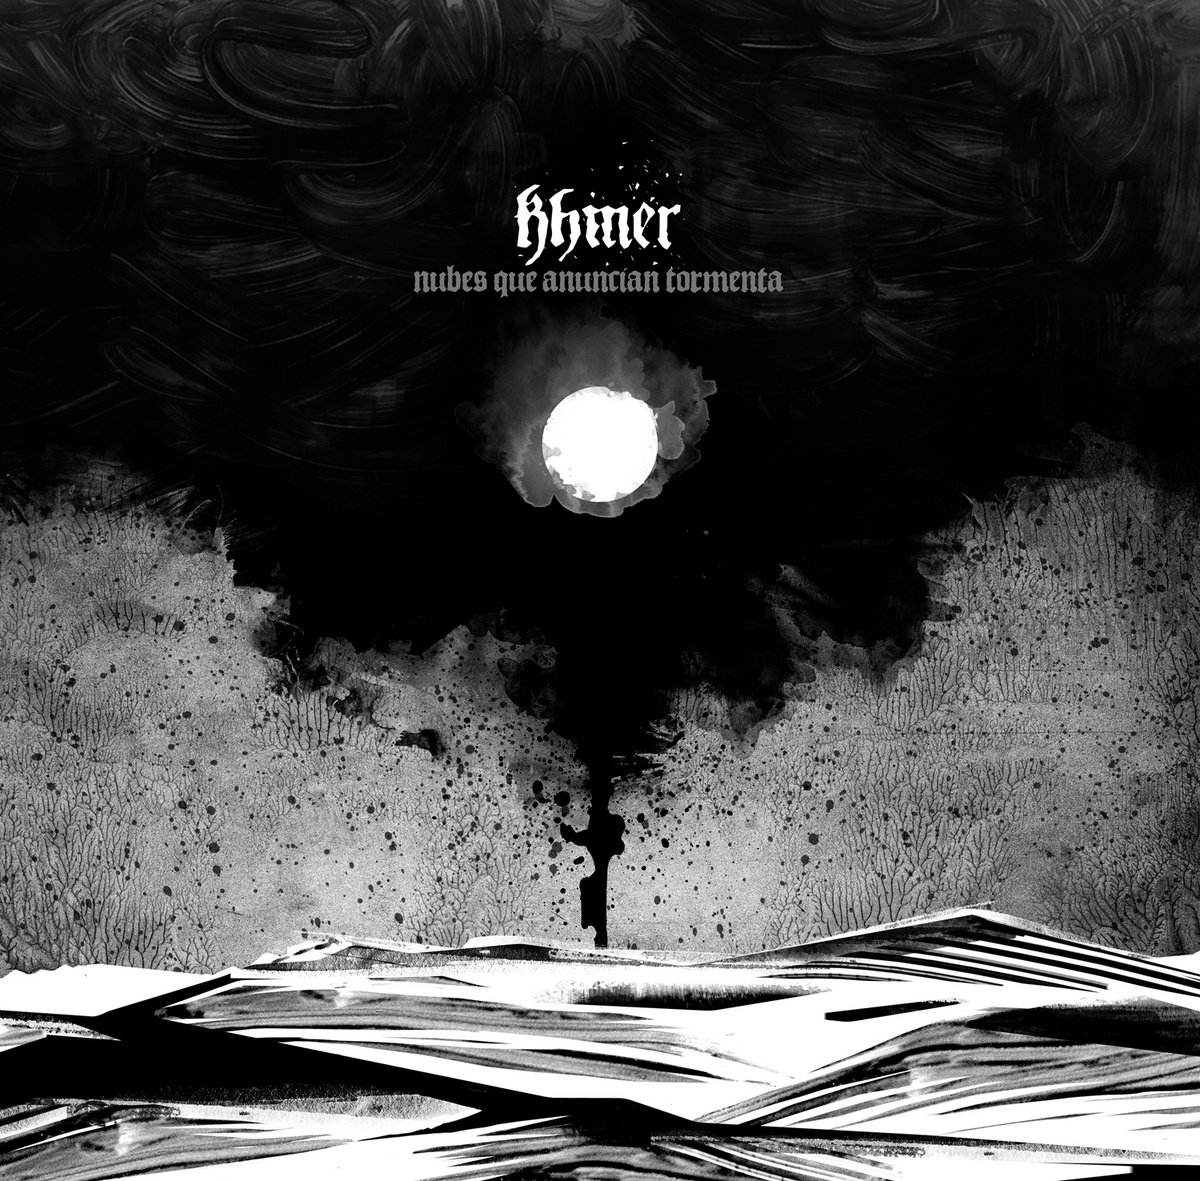 Khmer - Magna Mater @ 'Nubes Que Anuncian Tormenta' album (metal, spain)